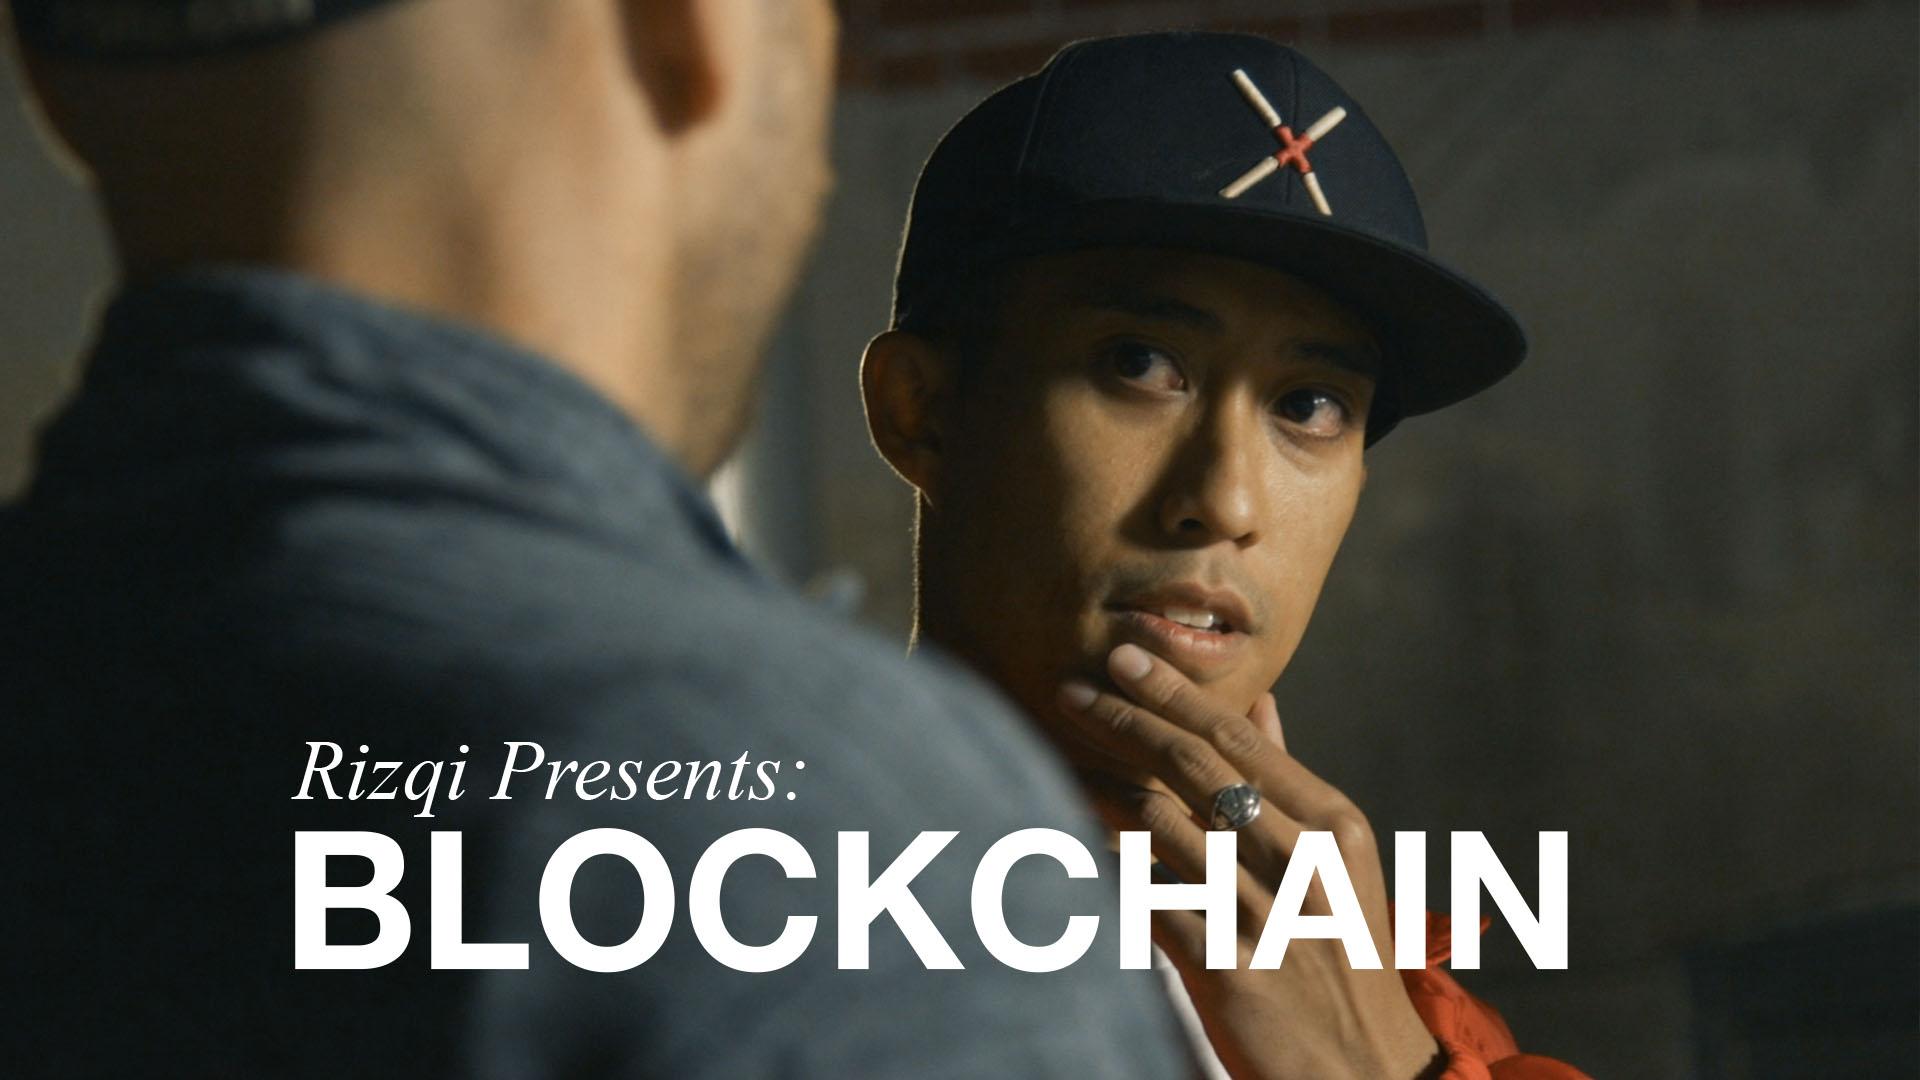 Rizqi Presents: Blockchain